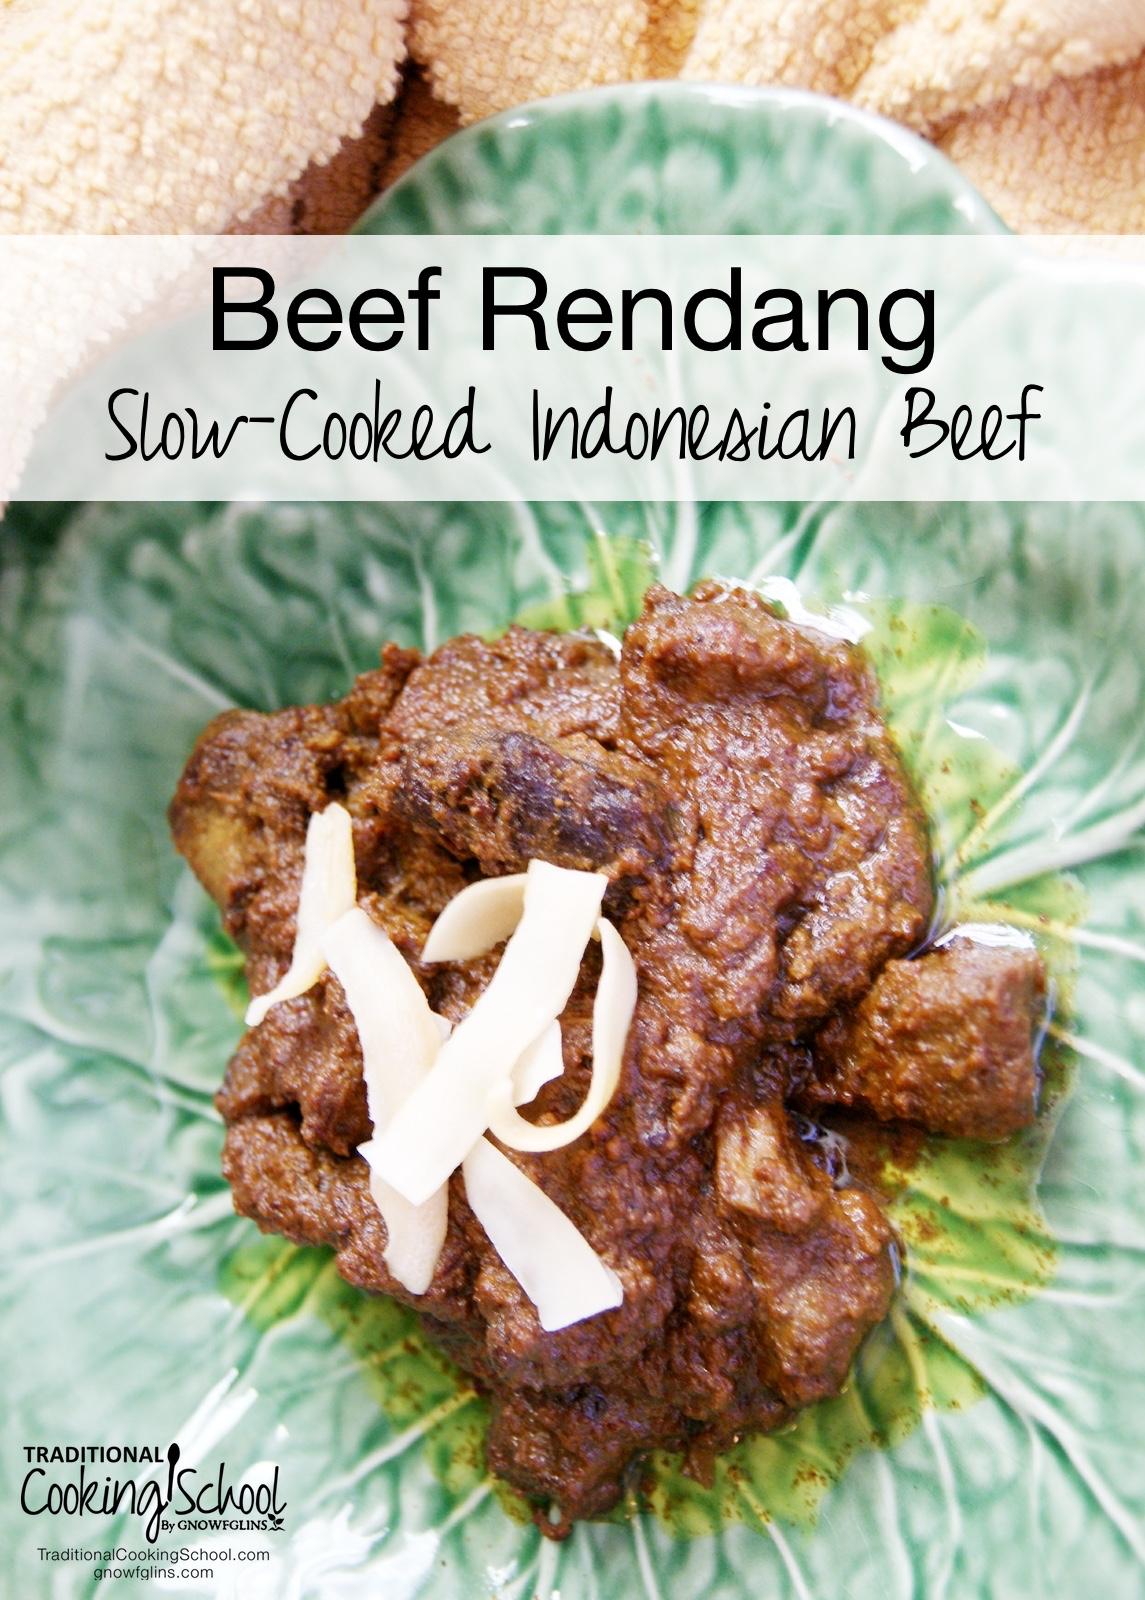 Beef Rendang Slow Cooked Indonesian Beef Beef Rendang Is A Common Indonesian